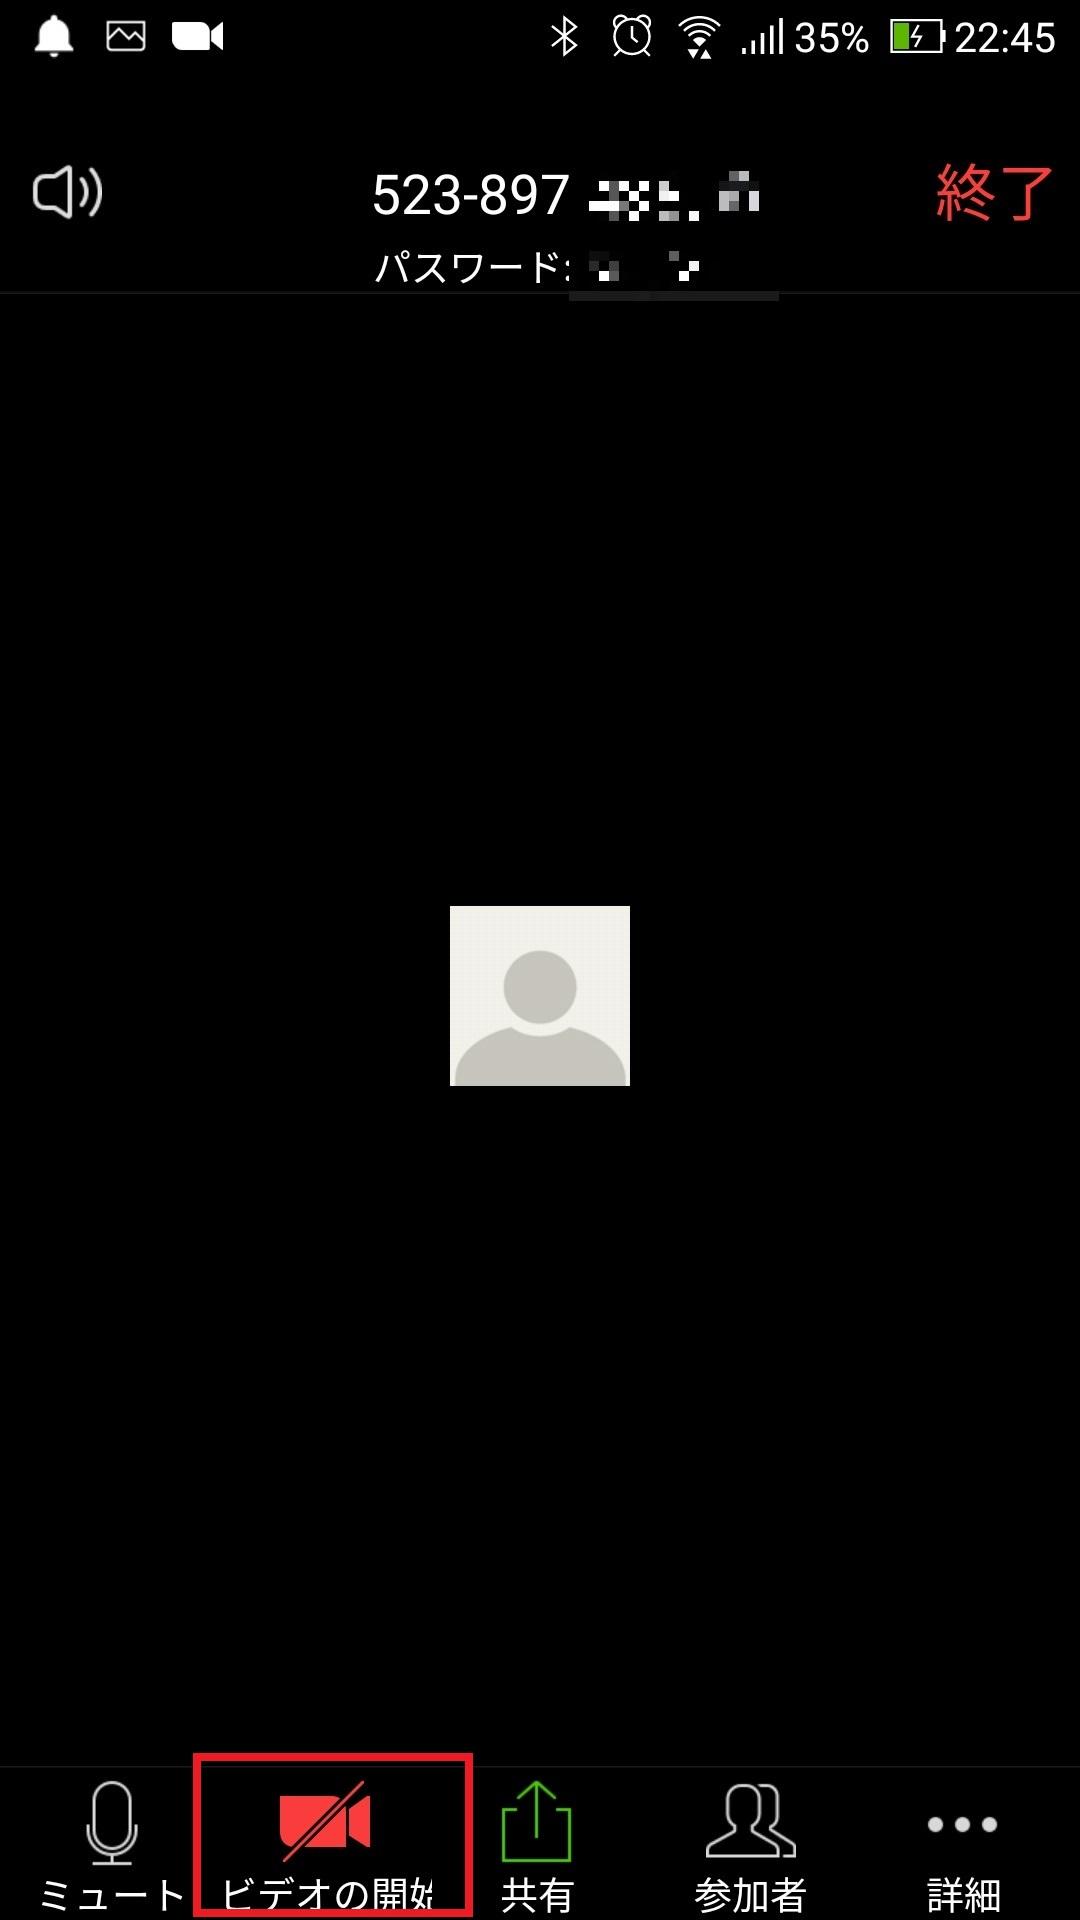 Screenshot 20200416 224520 - Zoomの使い方~一人で総合セルフチェック(パソコンとスマホを使って自分で)